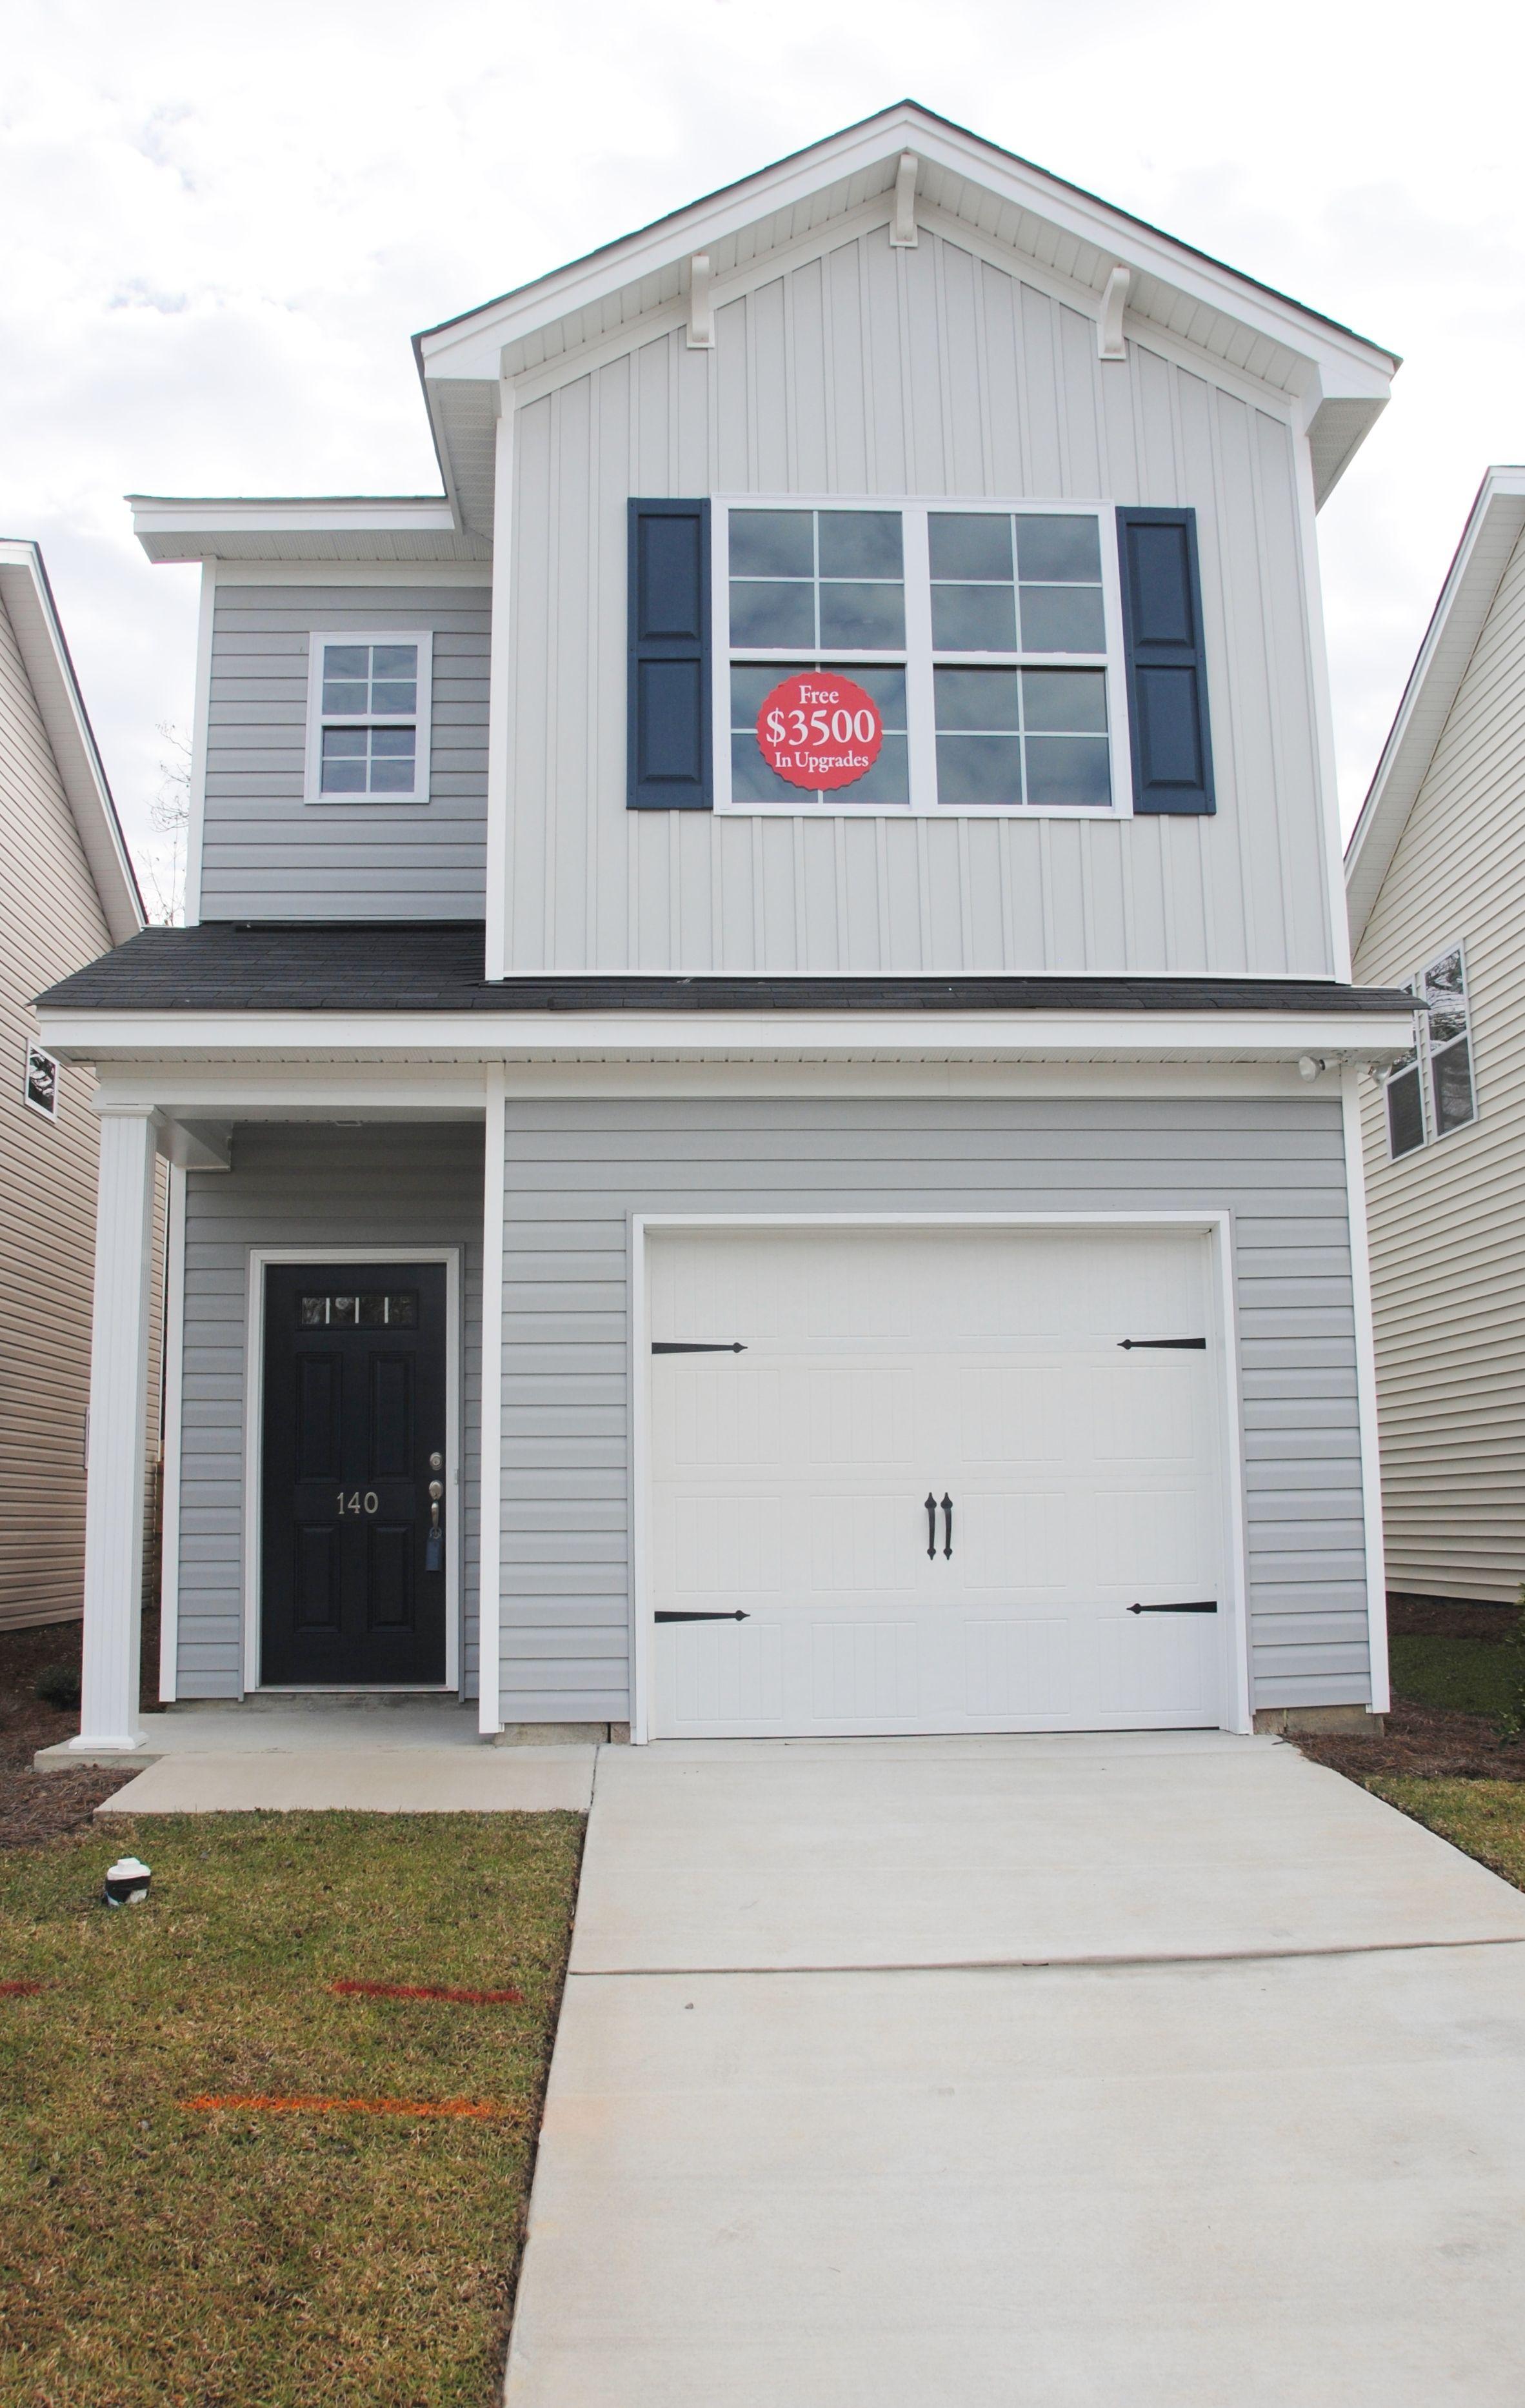 Mcguinn Hybrid Homes New Homes In Columbia Sc Columbia Home Builder New Homes Home Builders Home